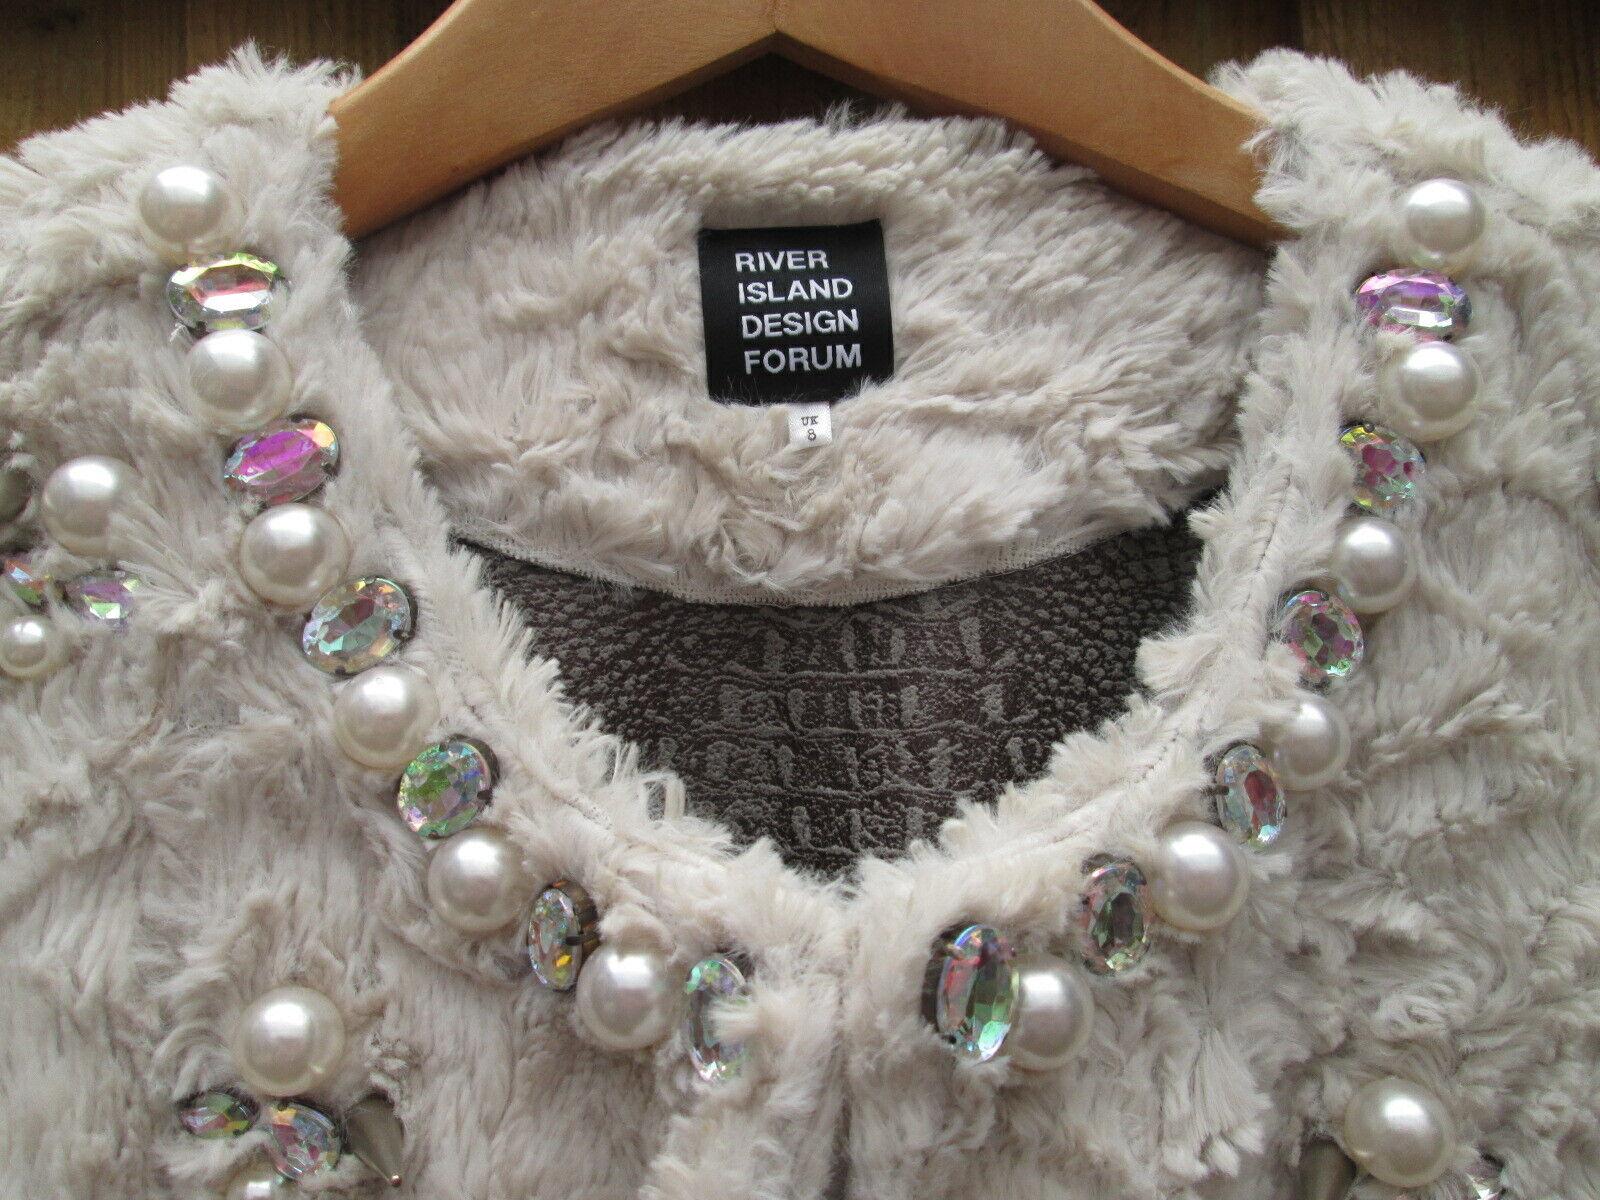 River Island DESIGNER FORUM faux fur coat studs diamantes size size size 8 UK (worn 1ce ) abf59a